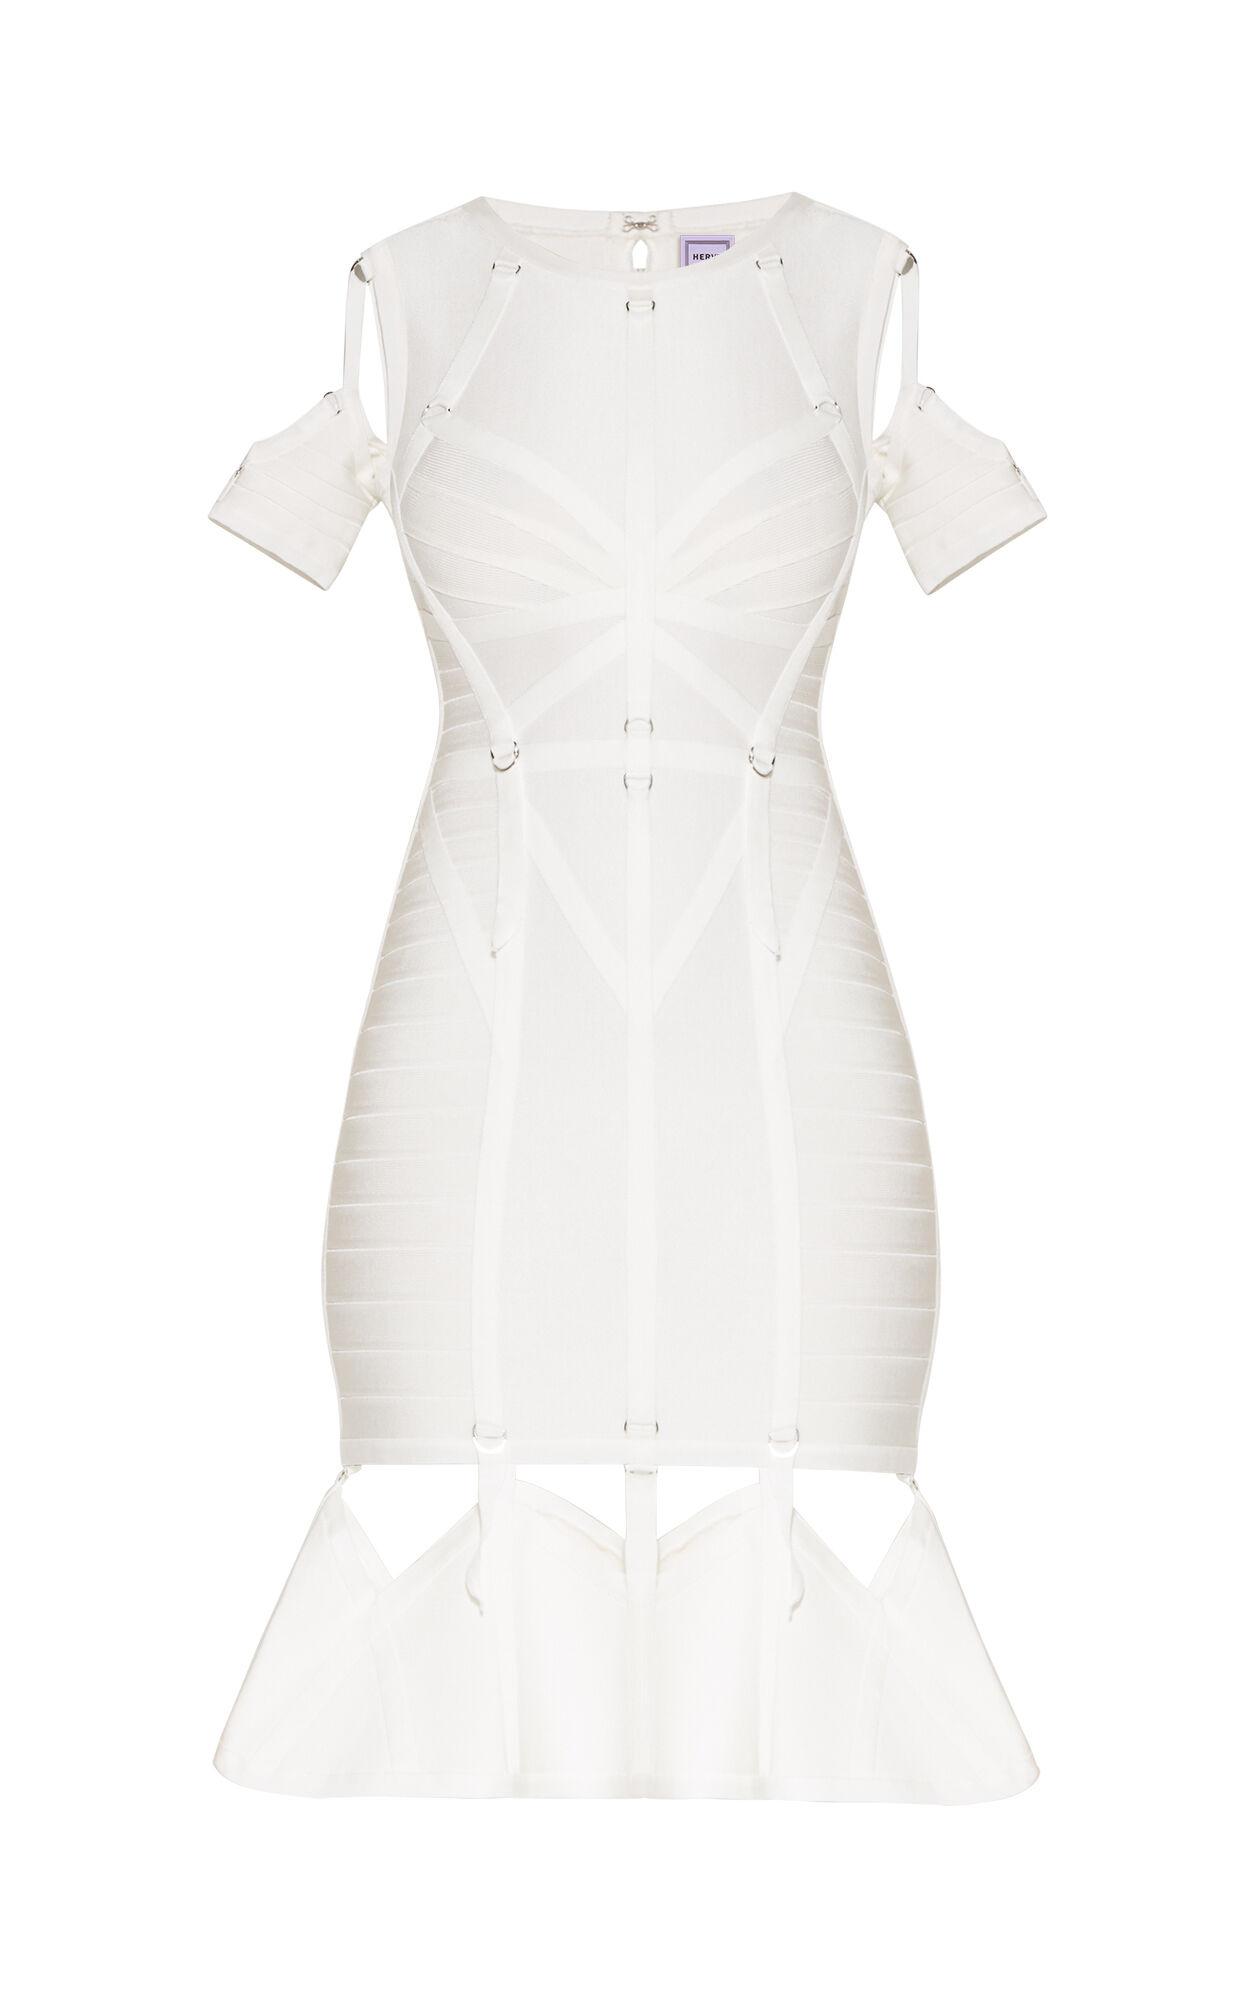 Alecia Ribbon Bandage D-Ring Flute Dress